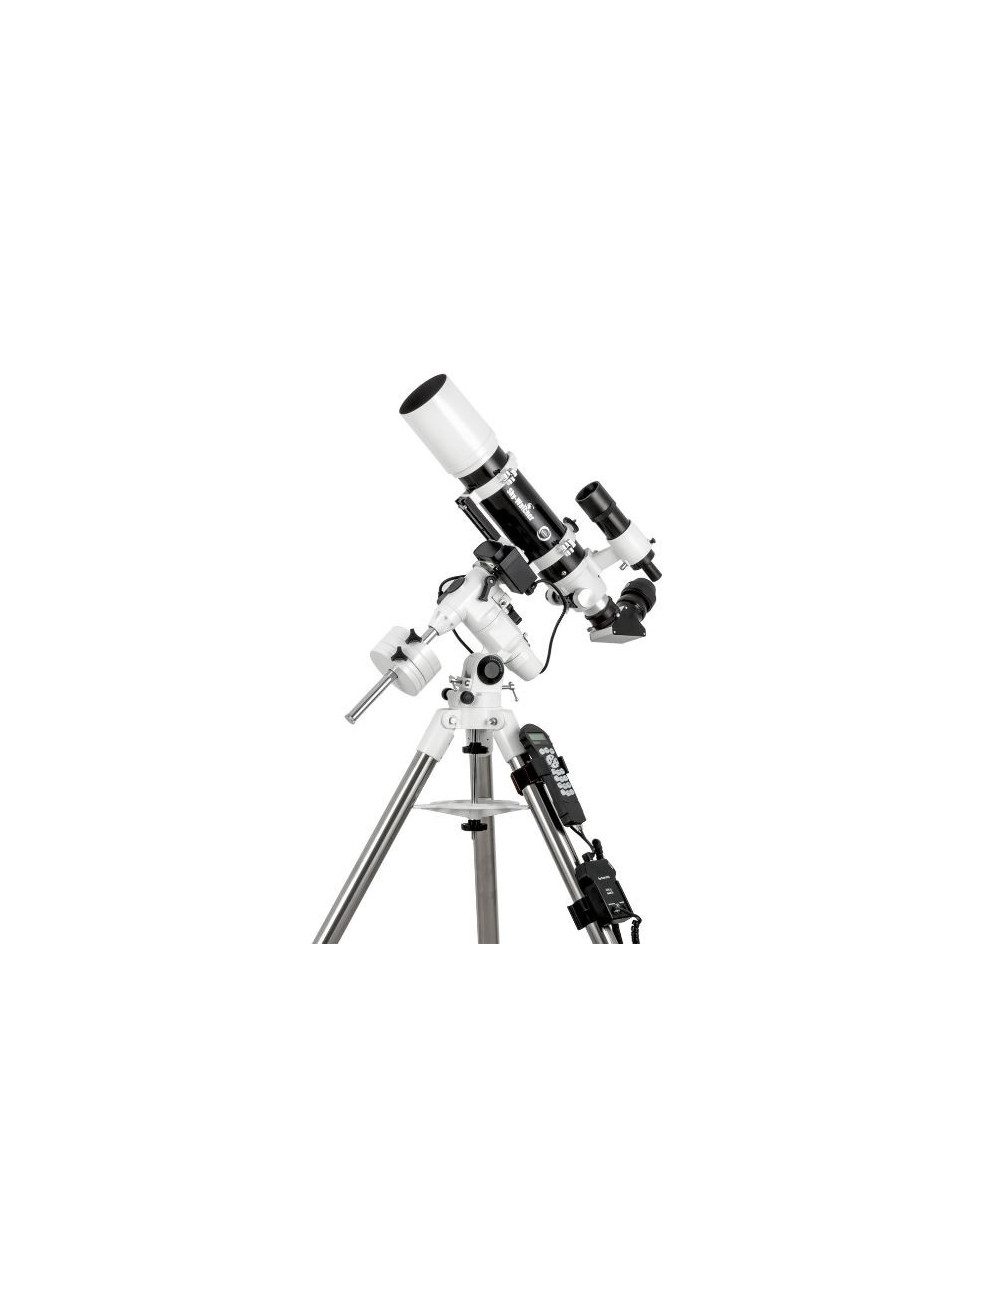 Lunette Sky-Watcher 80ED Black Diamond sur NEQ3-2 Pro Go-To